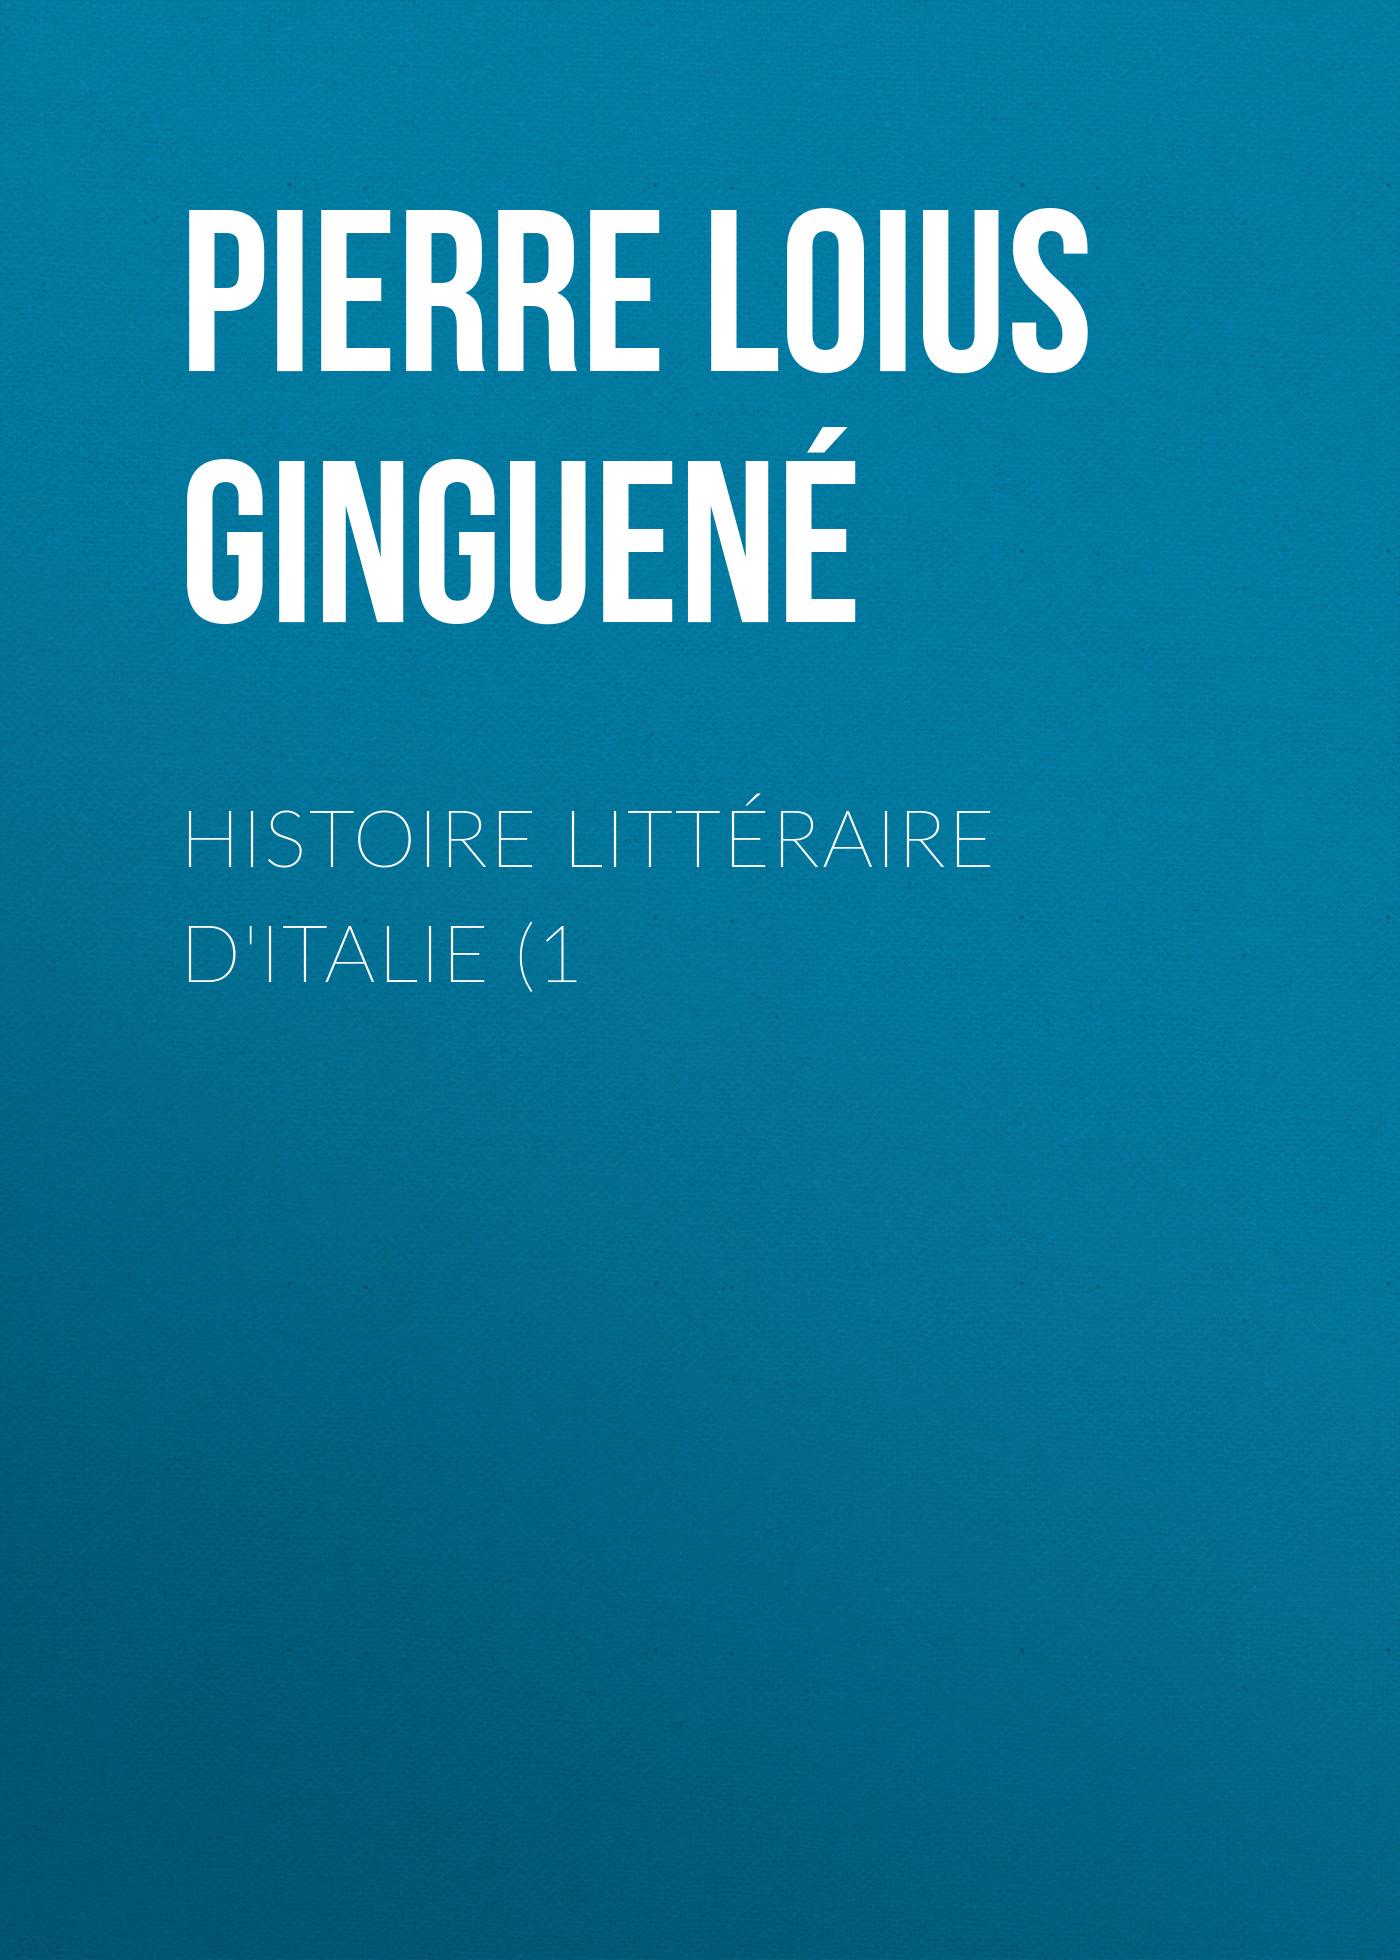 все цены на Pierre Loius Ginguené Histoire littéraire d'Italie (1 онлайн